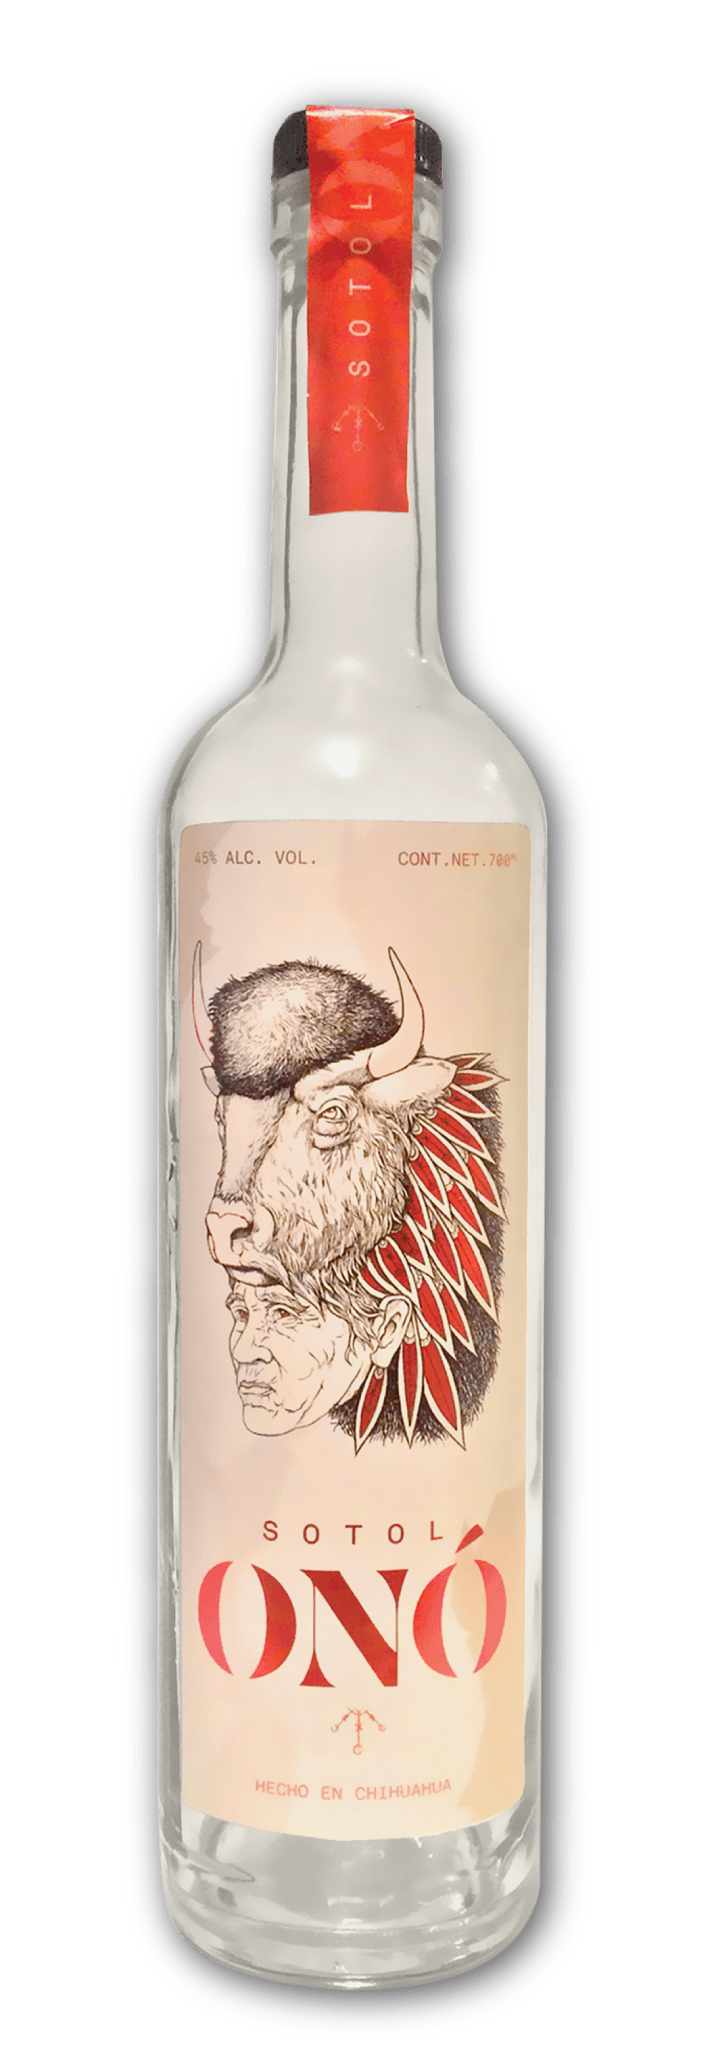 ono-sotol-bottle.png